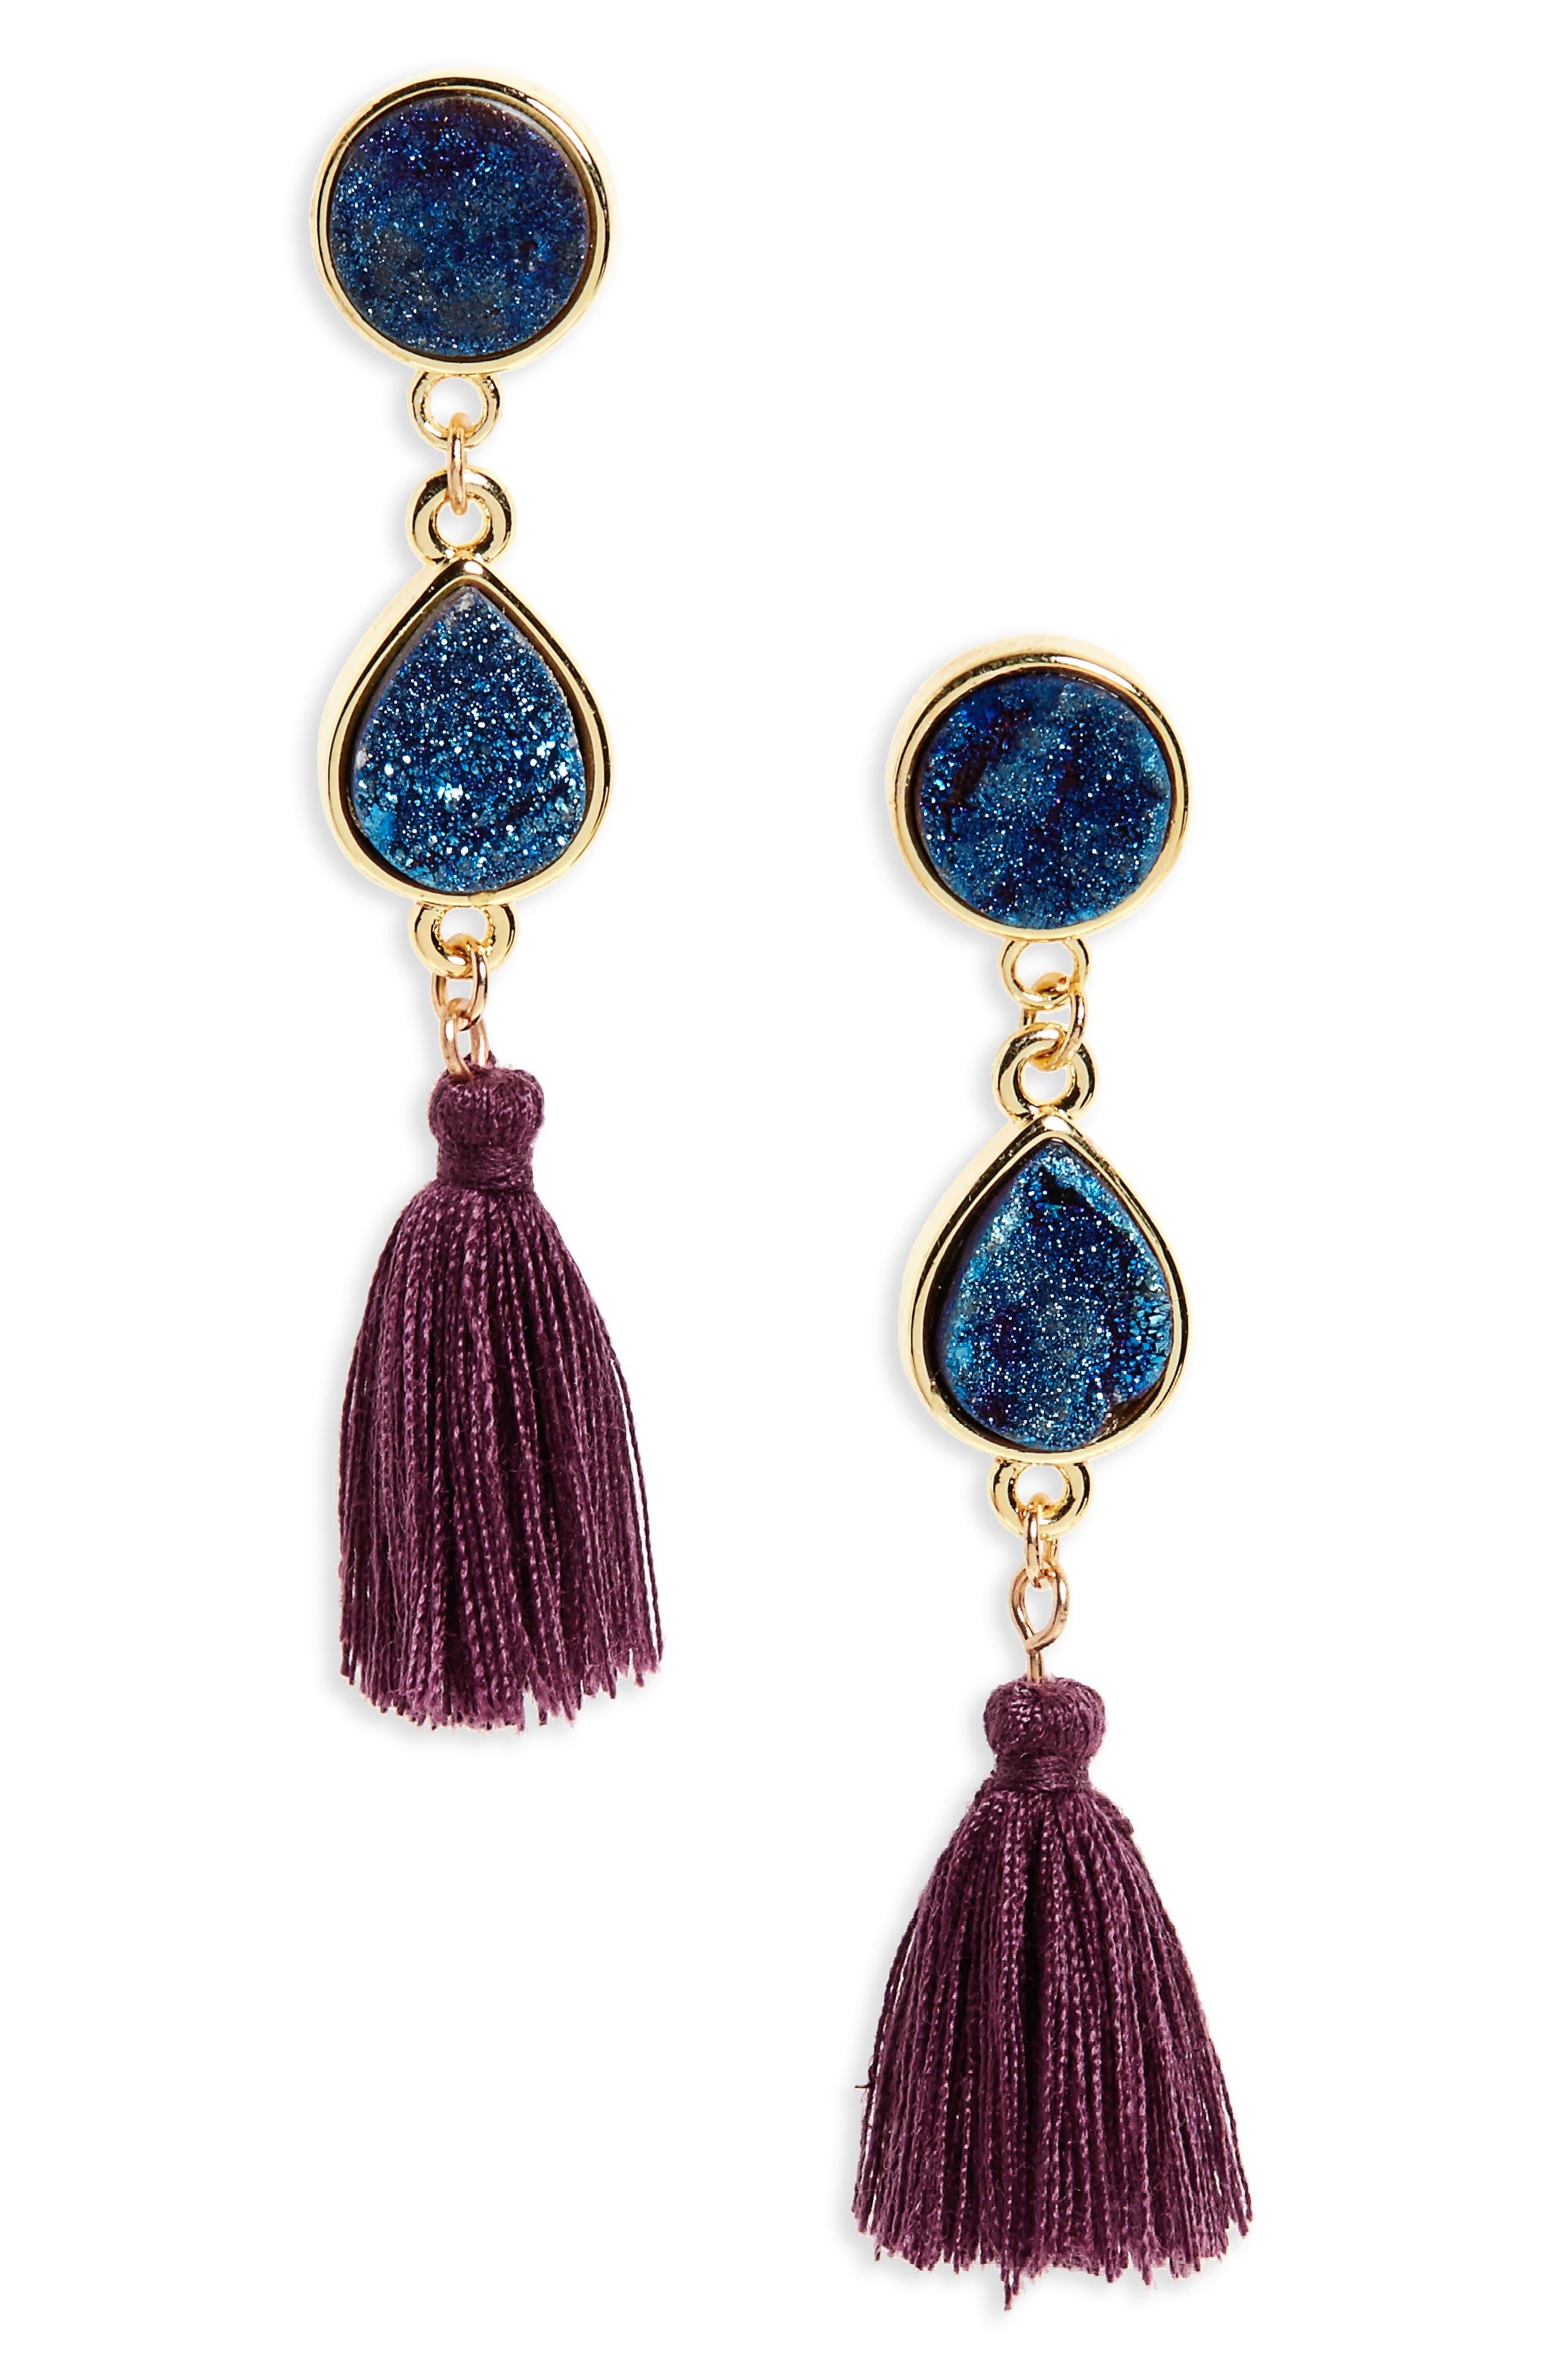 Drusy Quartz Tassel Earrings,                             Main thumbnail 1, color,                             410